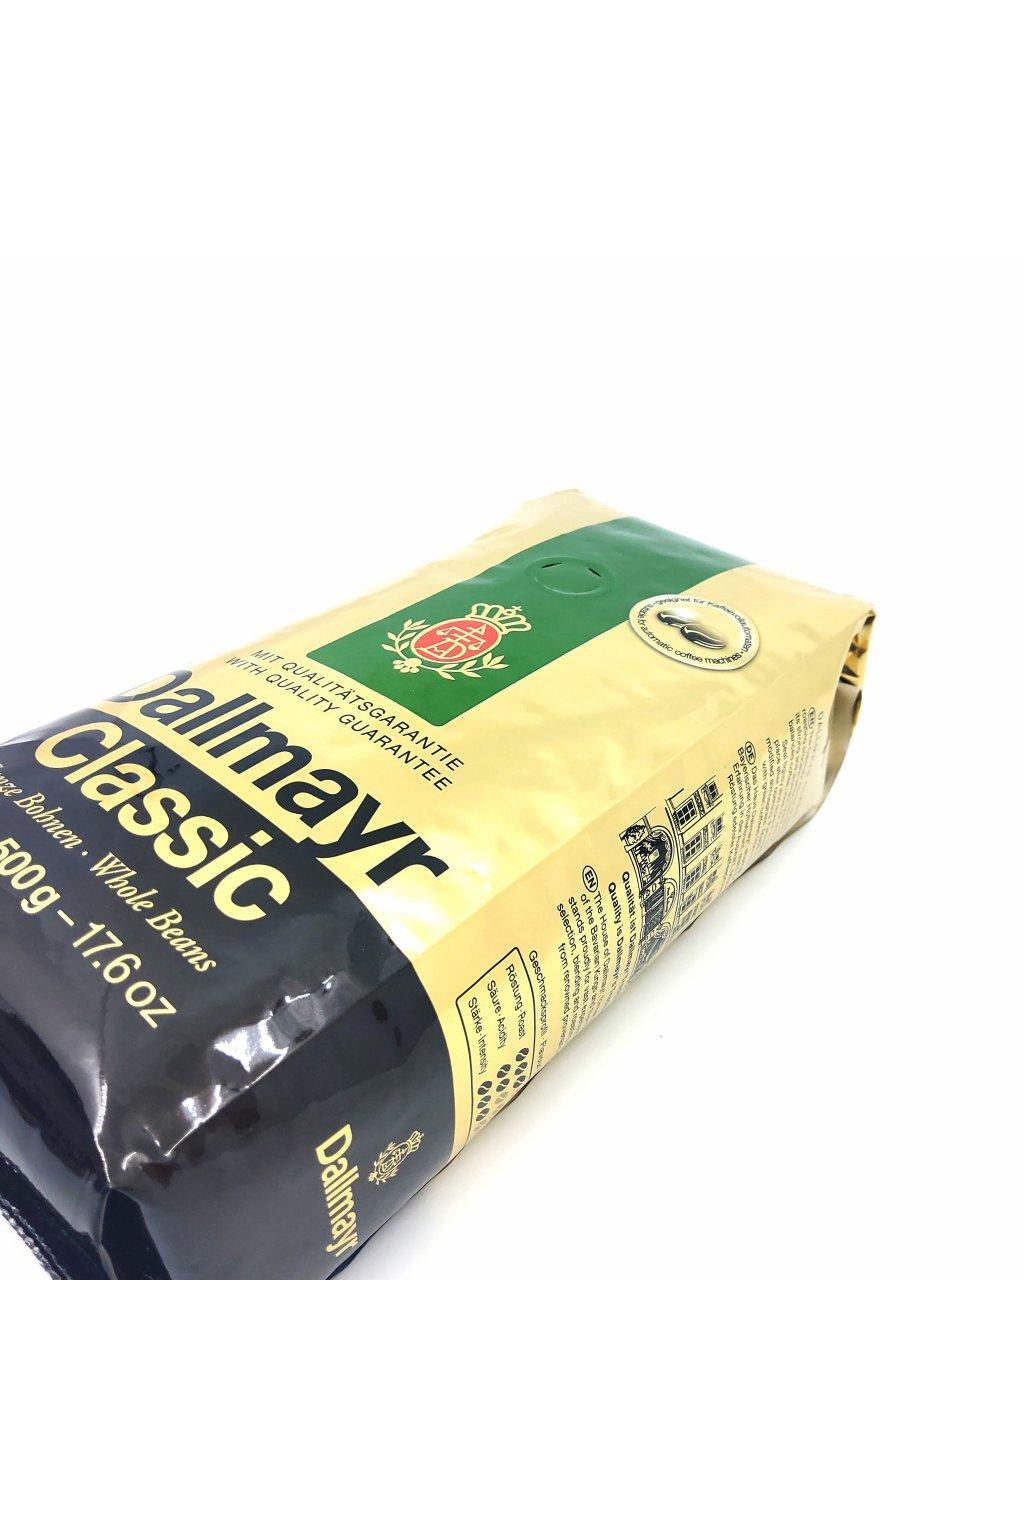 822 dallmayr classic zrnkova 500 g